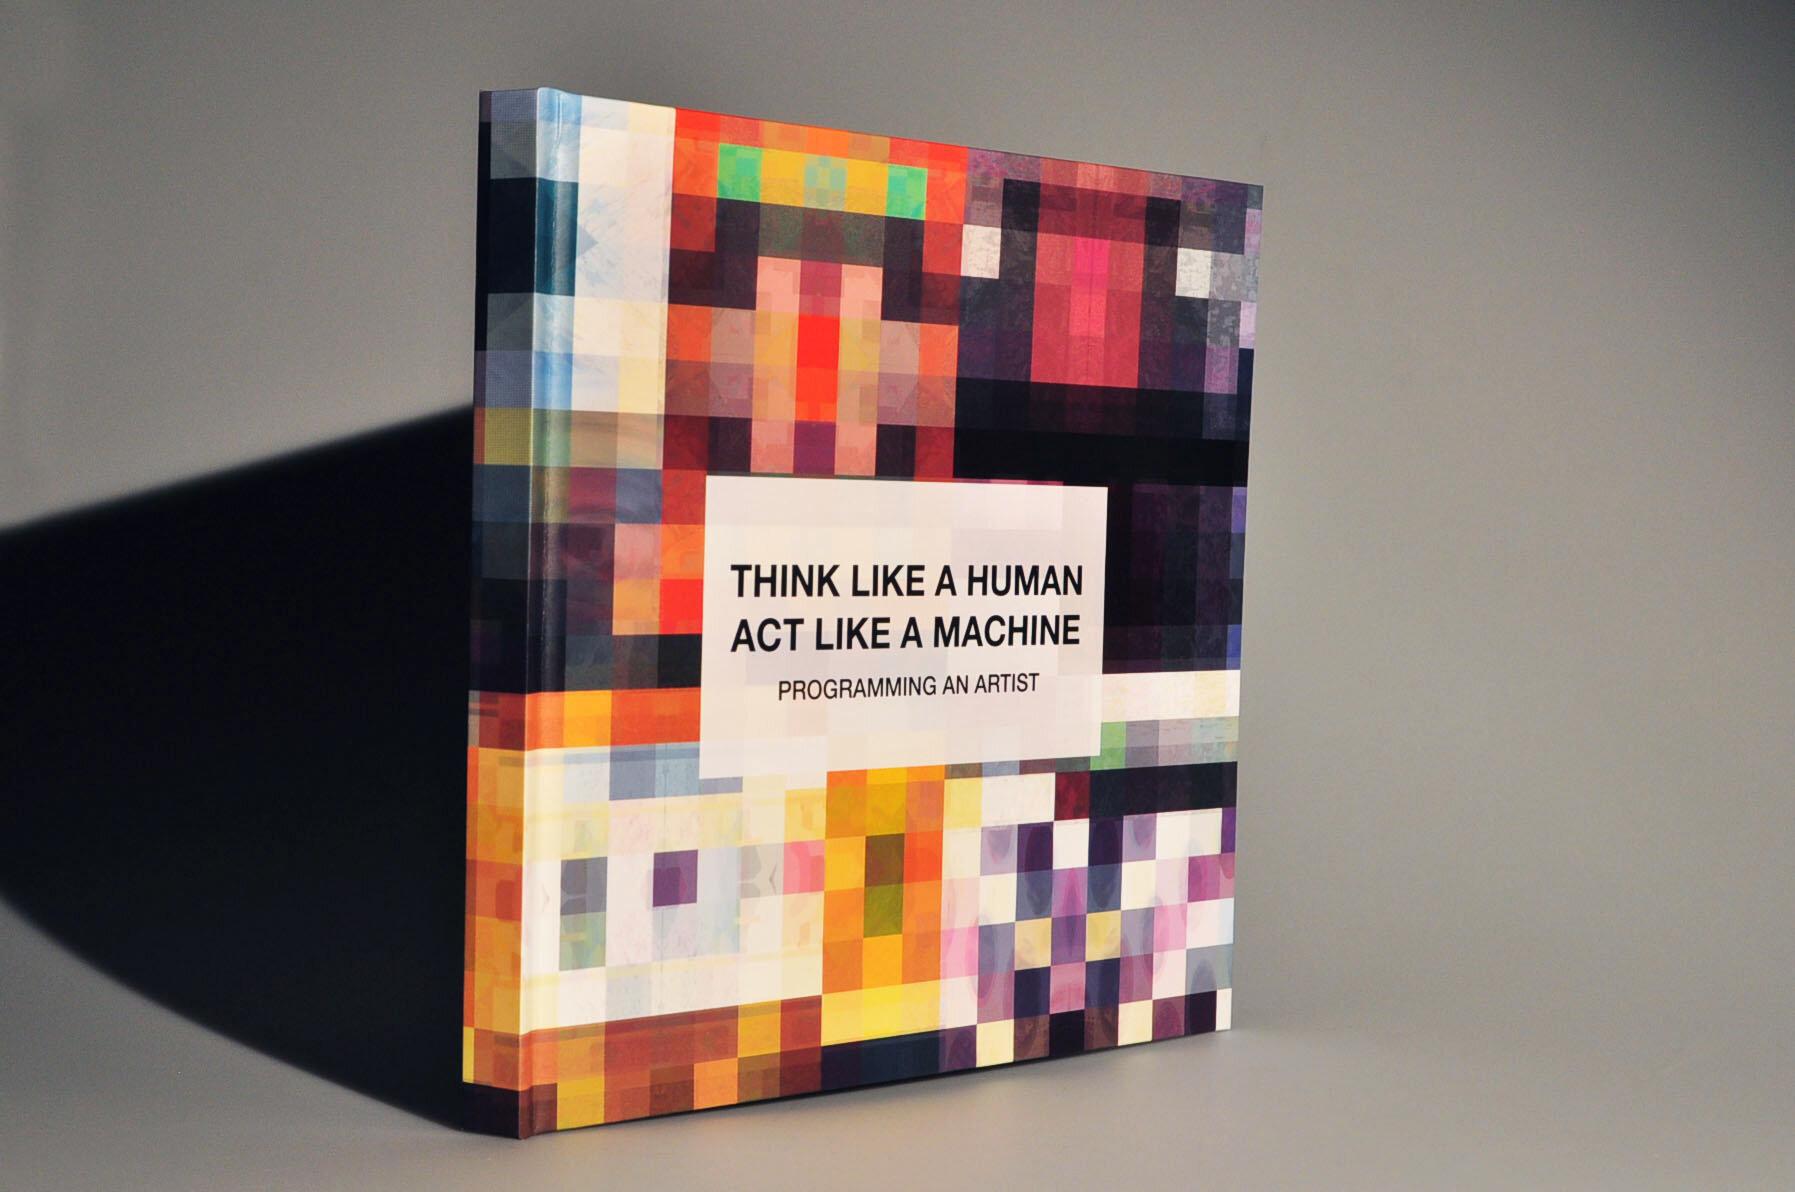 Think Like a Human Act Like a Machine: Programming an Artist